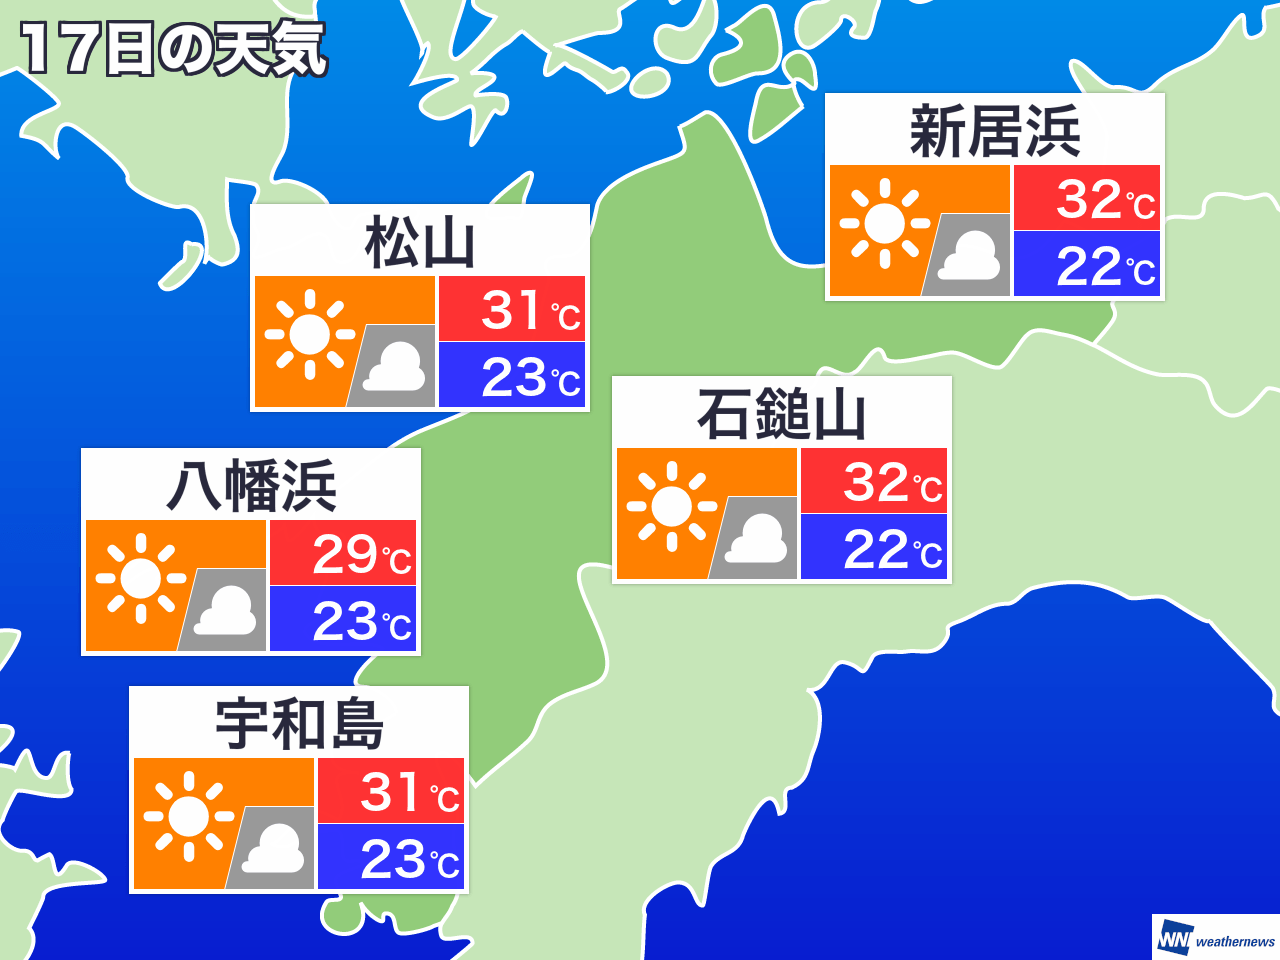 松山 市 の 天気 予報